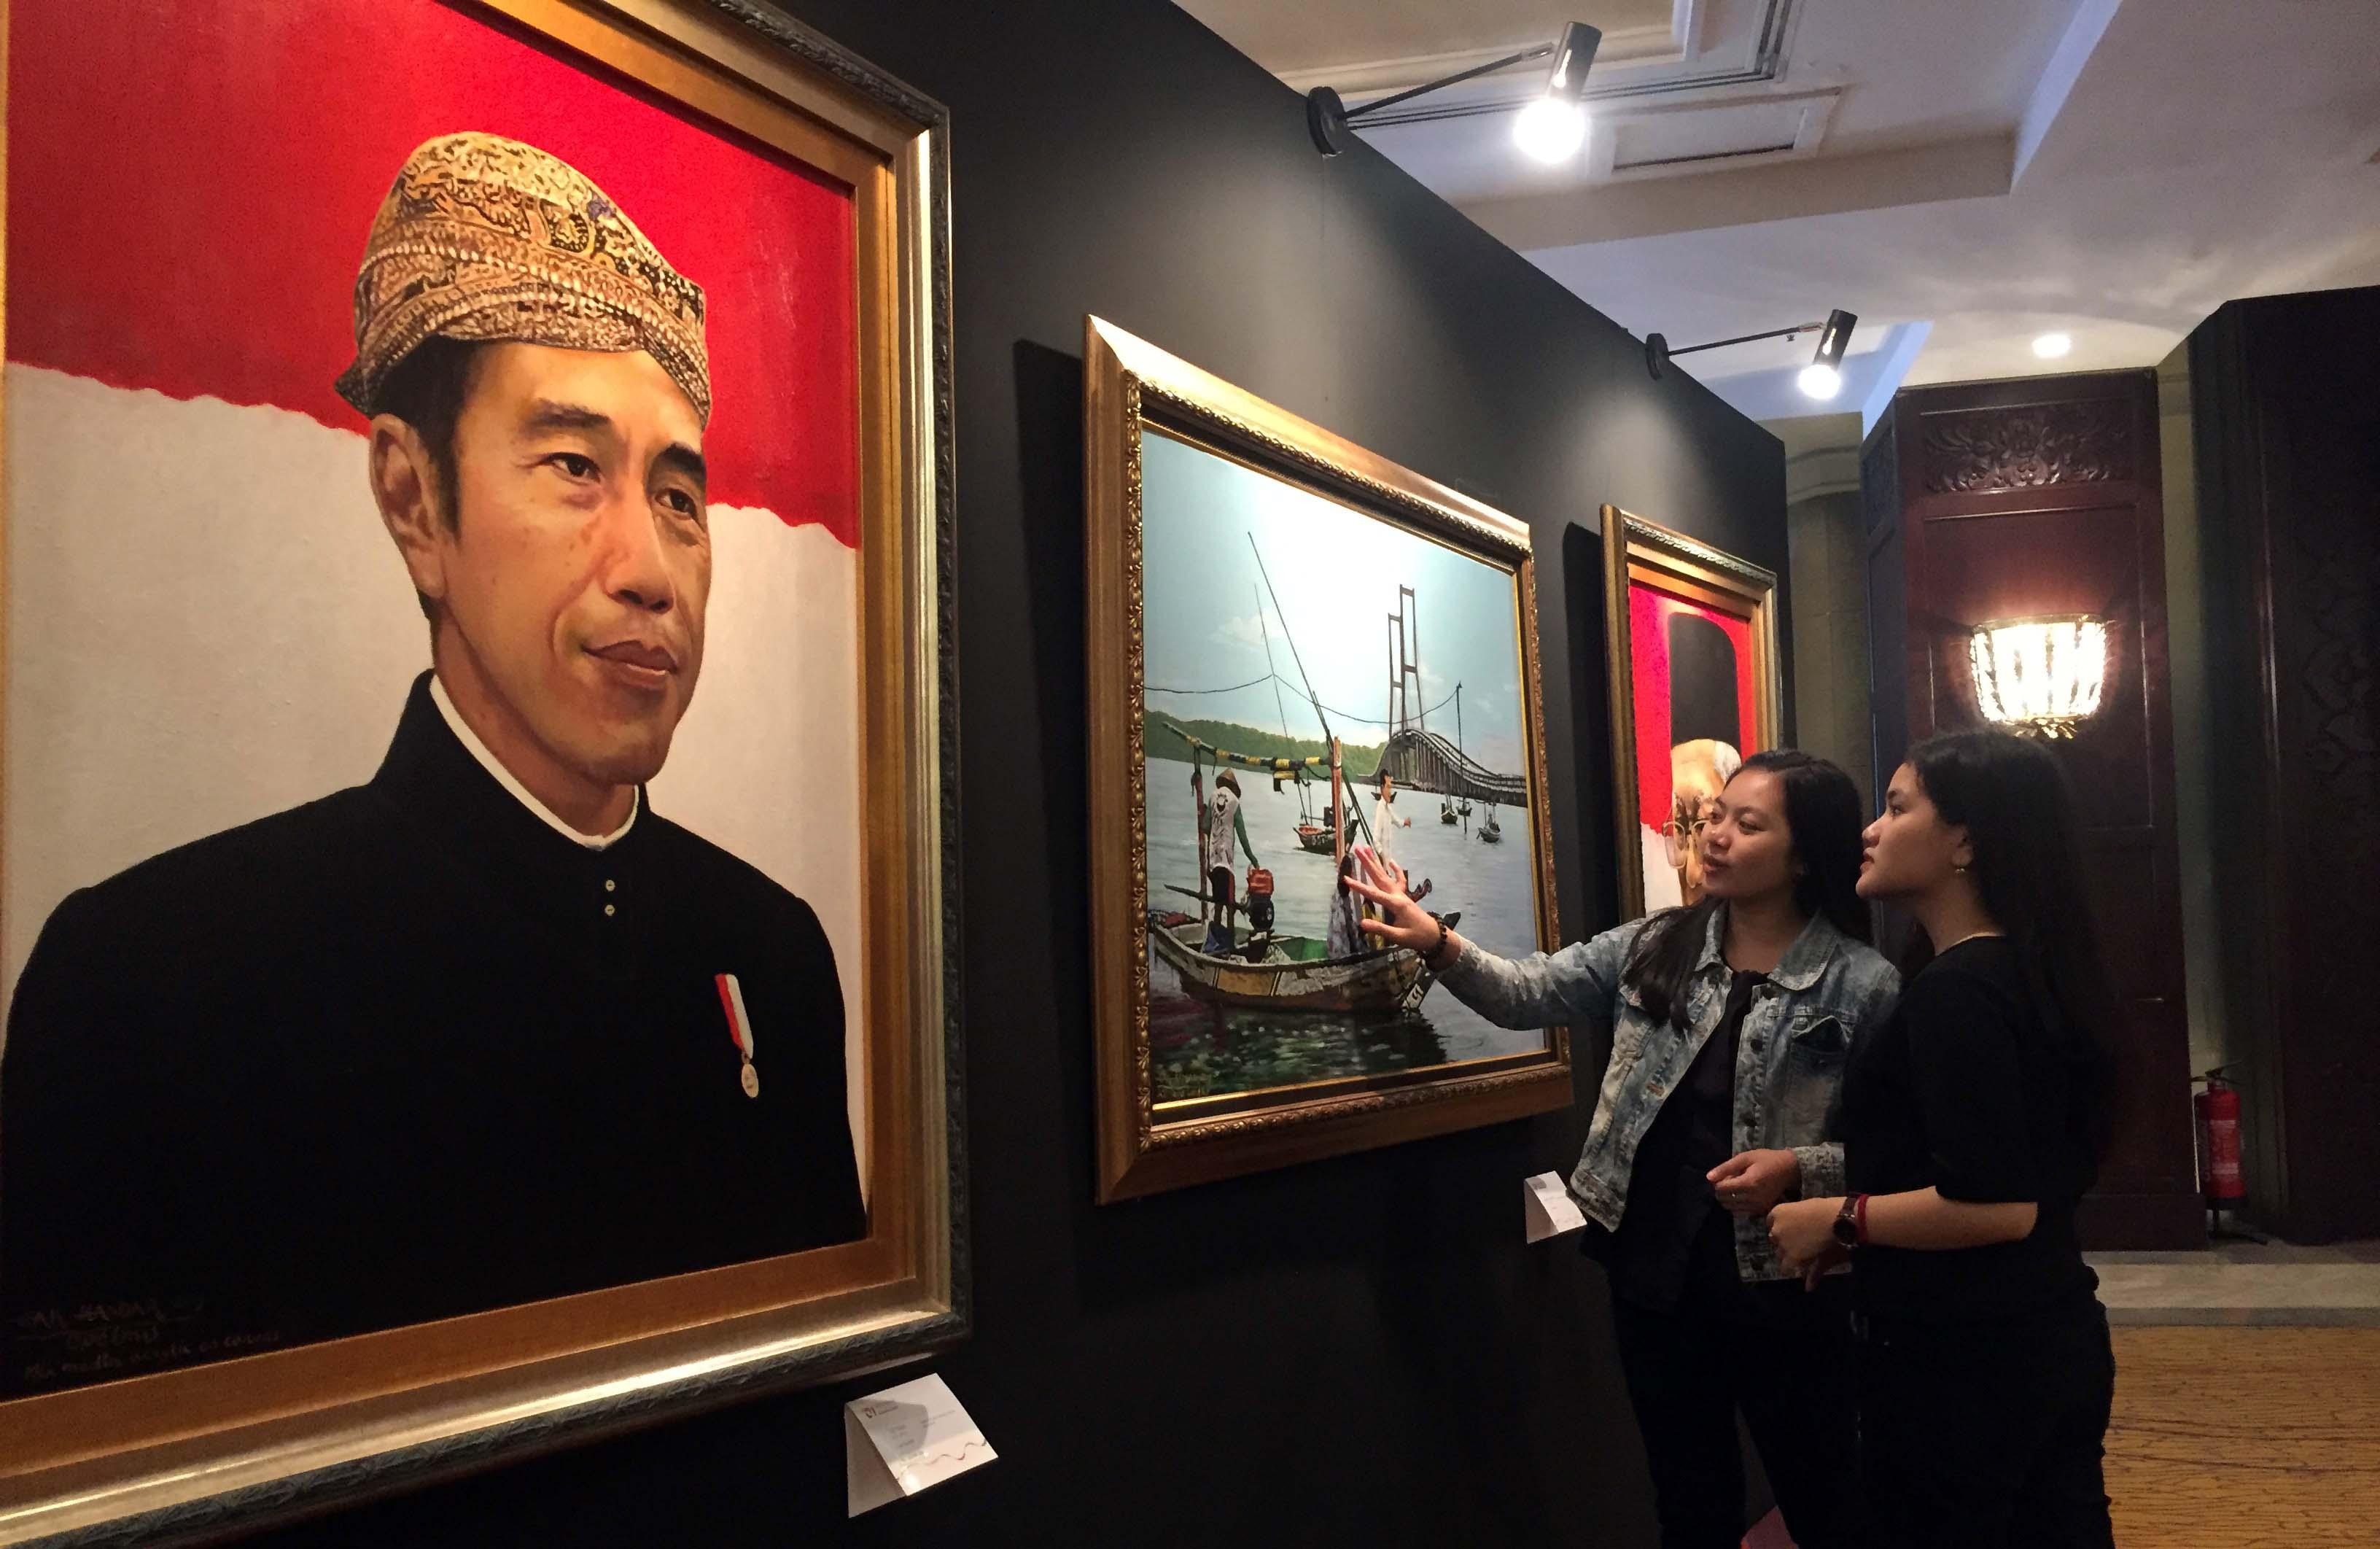 Lelang Benda Koleksi Jokowi, TKN Target Kumpulkan Rp3 Miliar